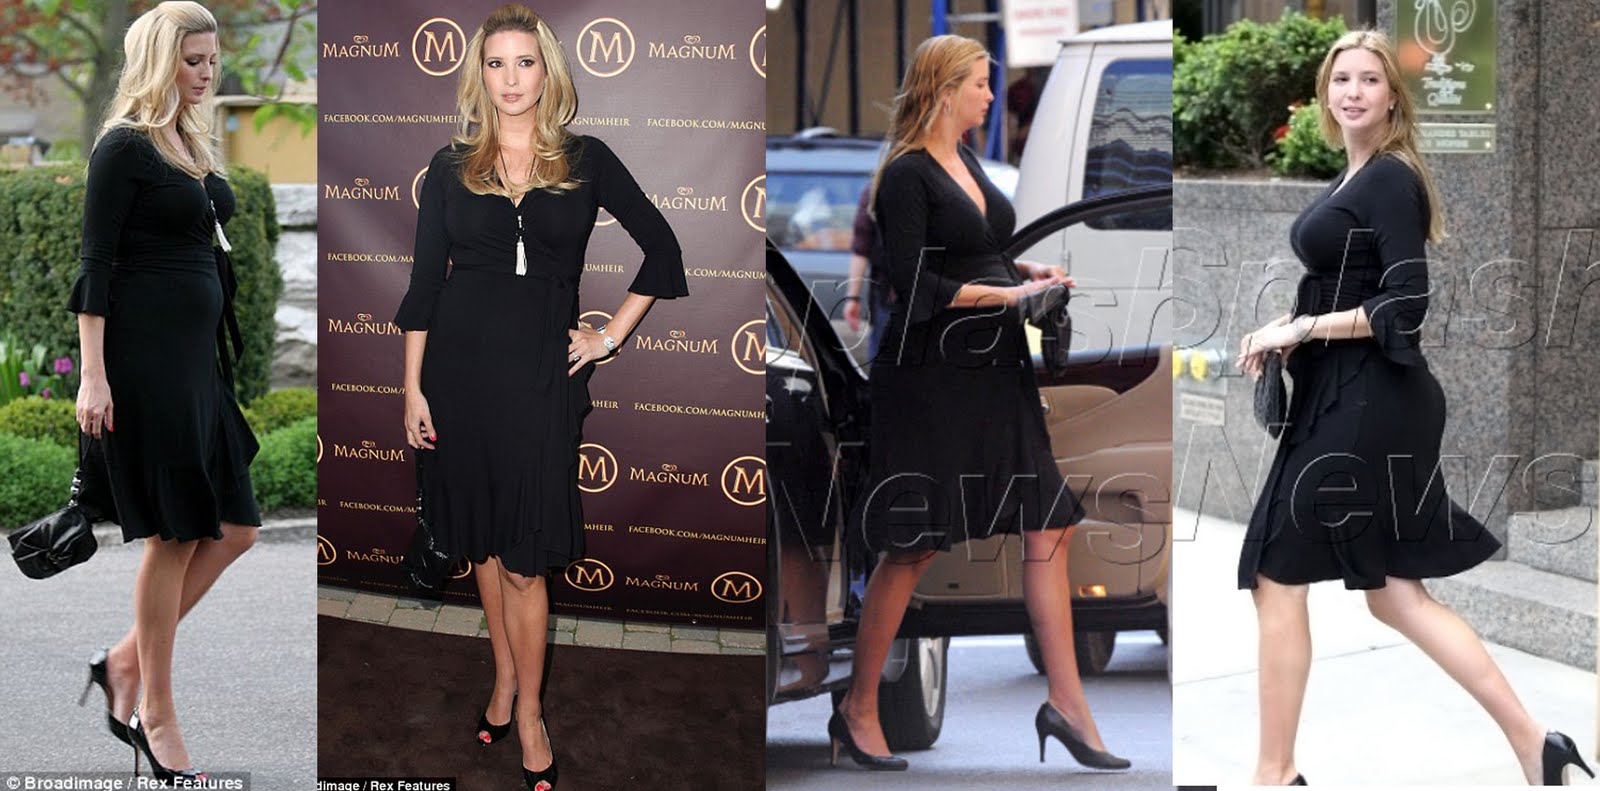 http://1.bp.blogspot.com/-ZYDnDcBXkX4/Tg2MlzQwHxI/AAAAAAAAHKc/Jo1VZGjlELY/s1600/2632_Ivanka+Trump+loves+her+Isabella+Oliver+Ruffle+Wrap+Dress.jpg